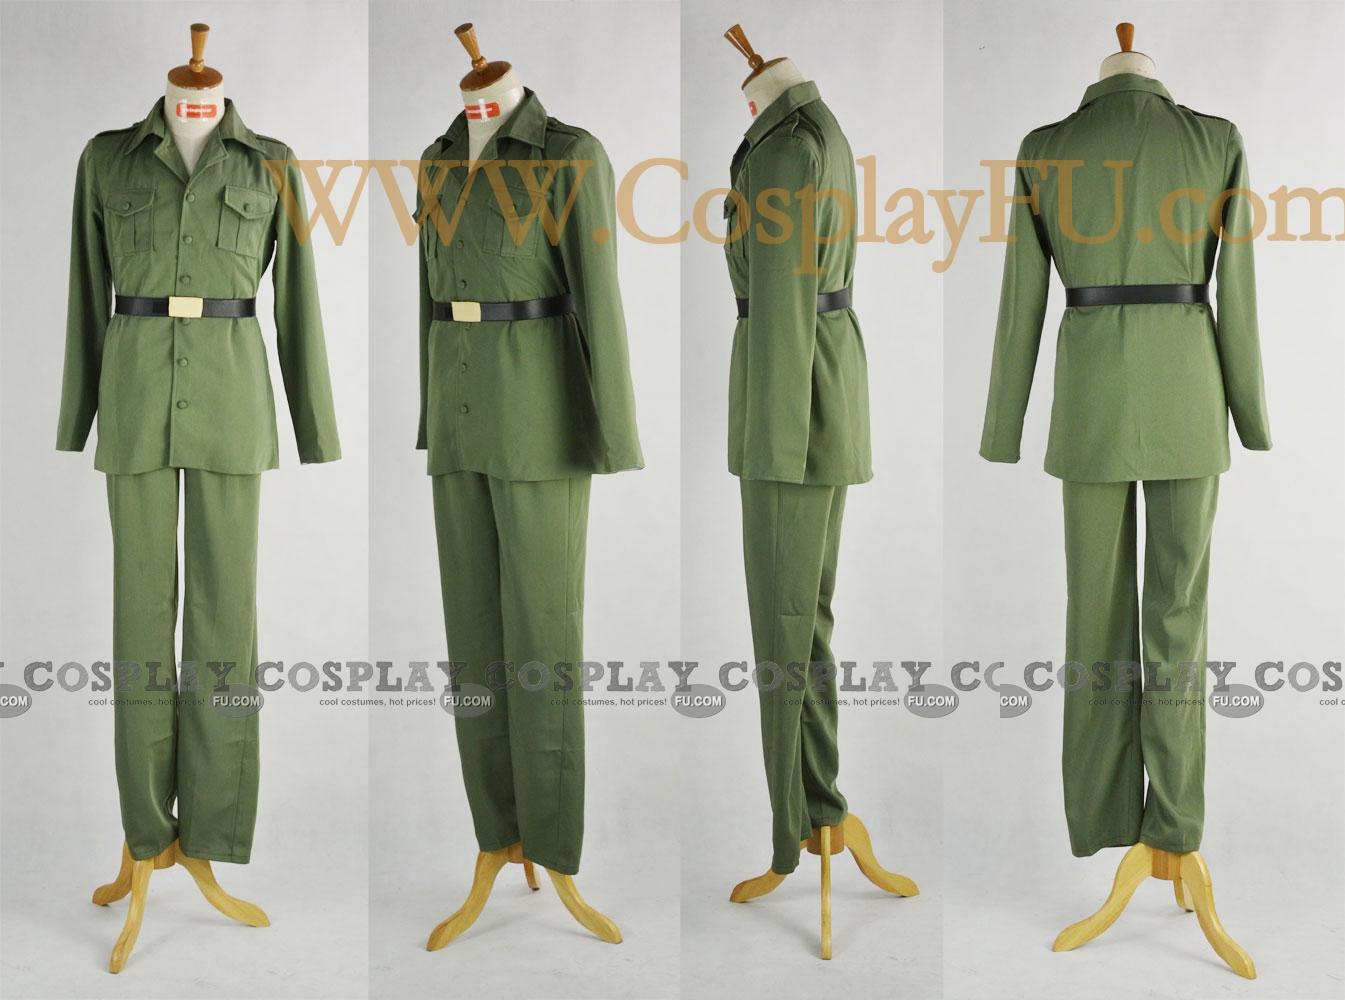 Australia Cosplay Costume from Axis Powers Hetalia